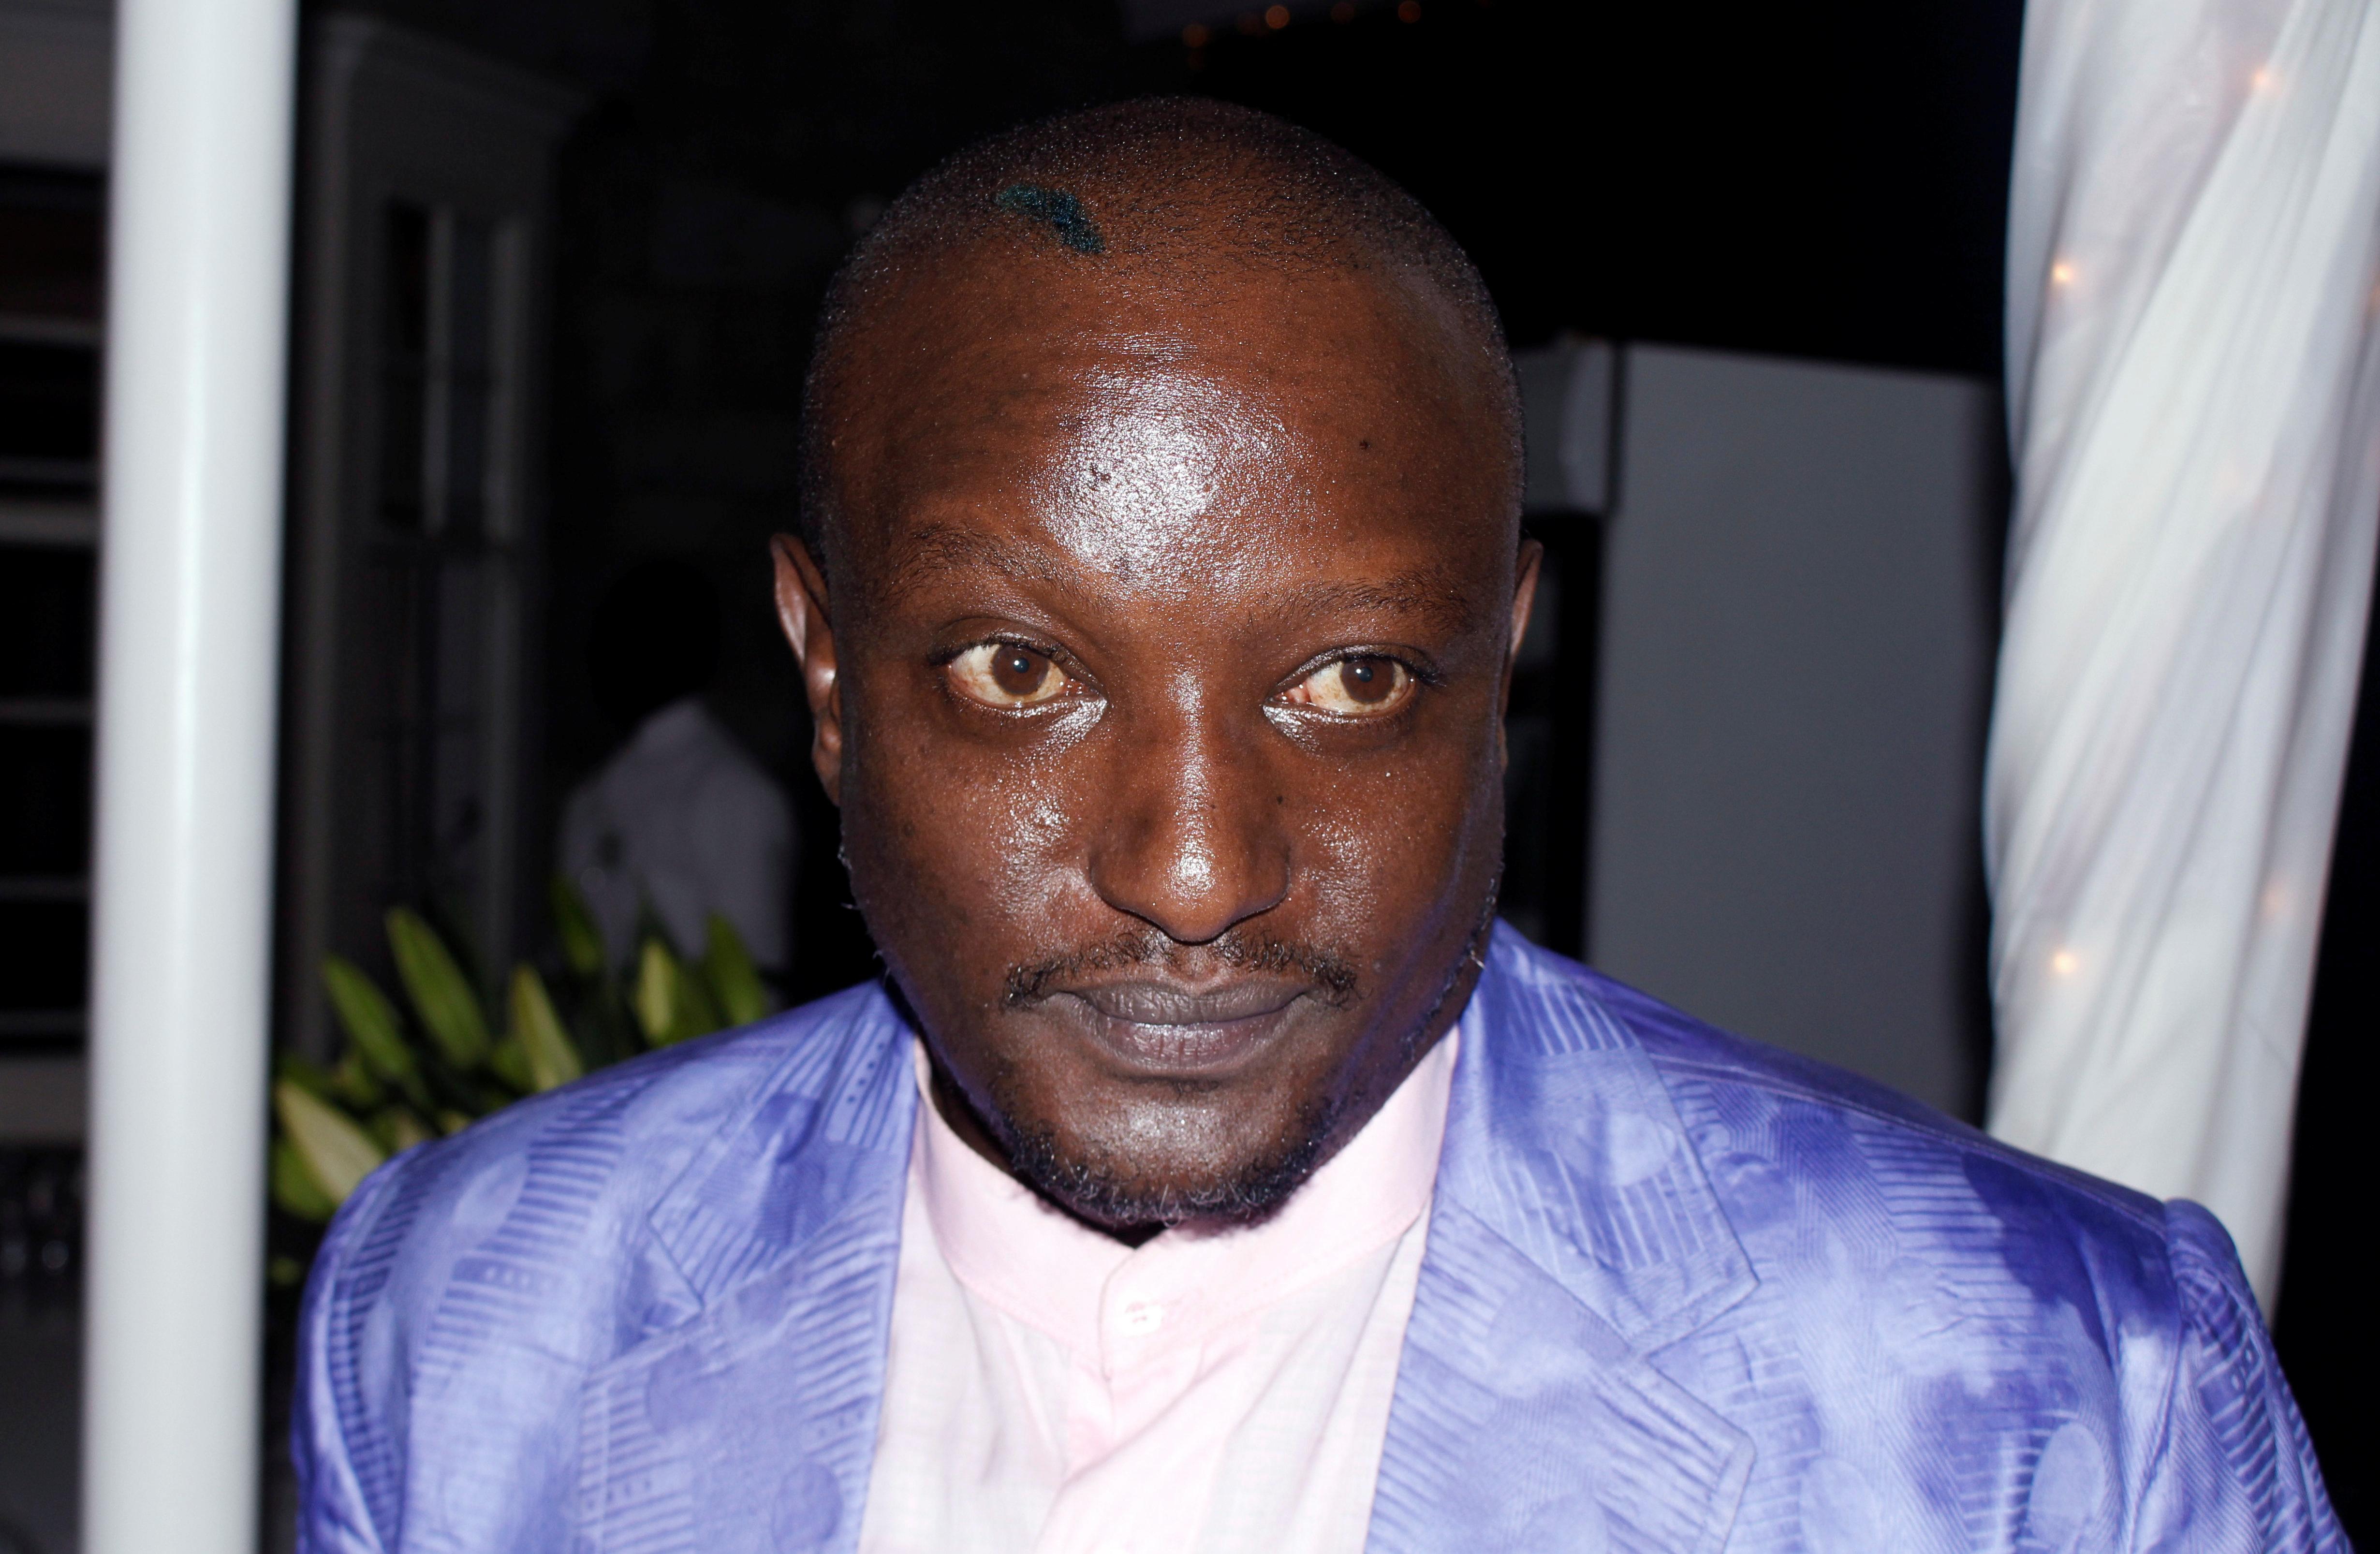 Portrait of the late Binyavanga Wainaina in shiny purple suit with white shirt